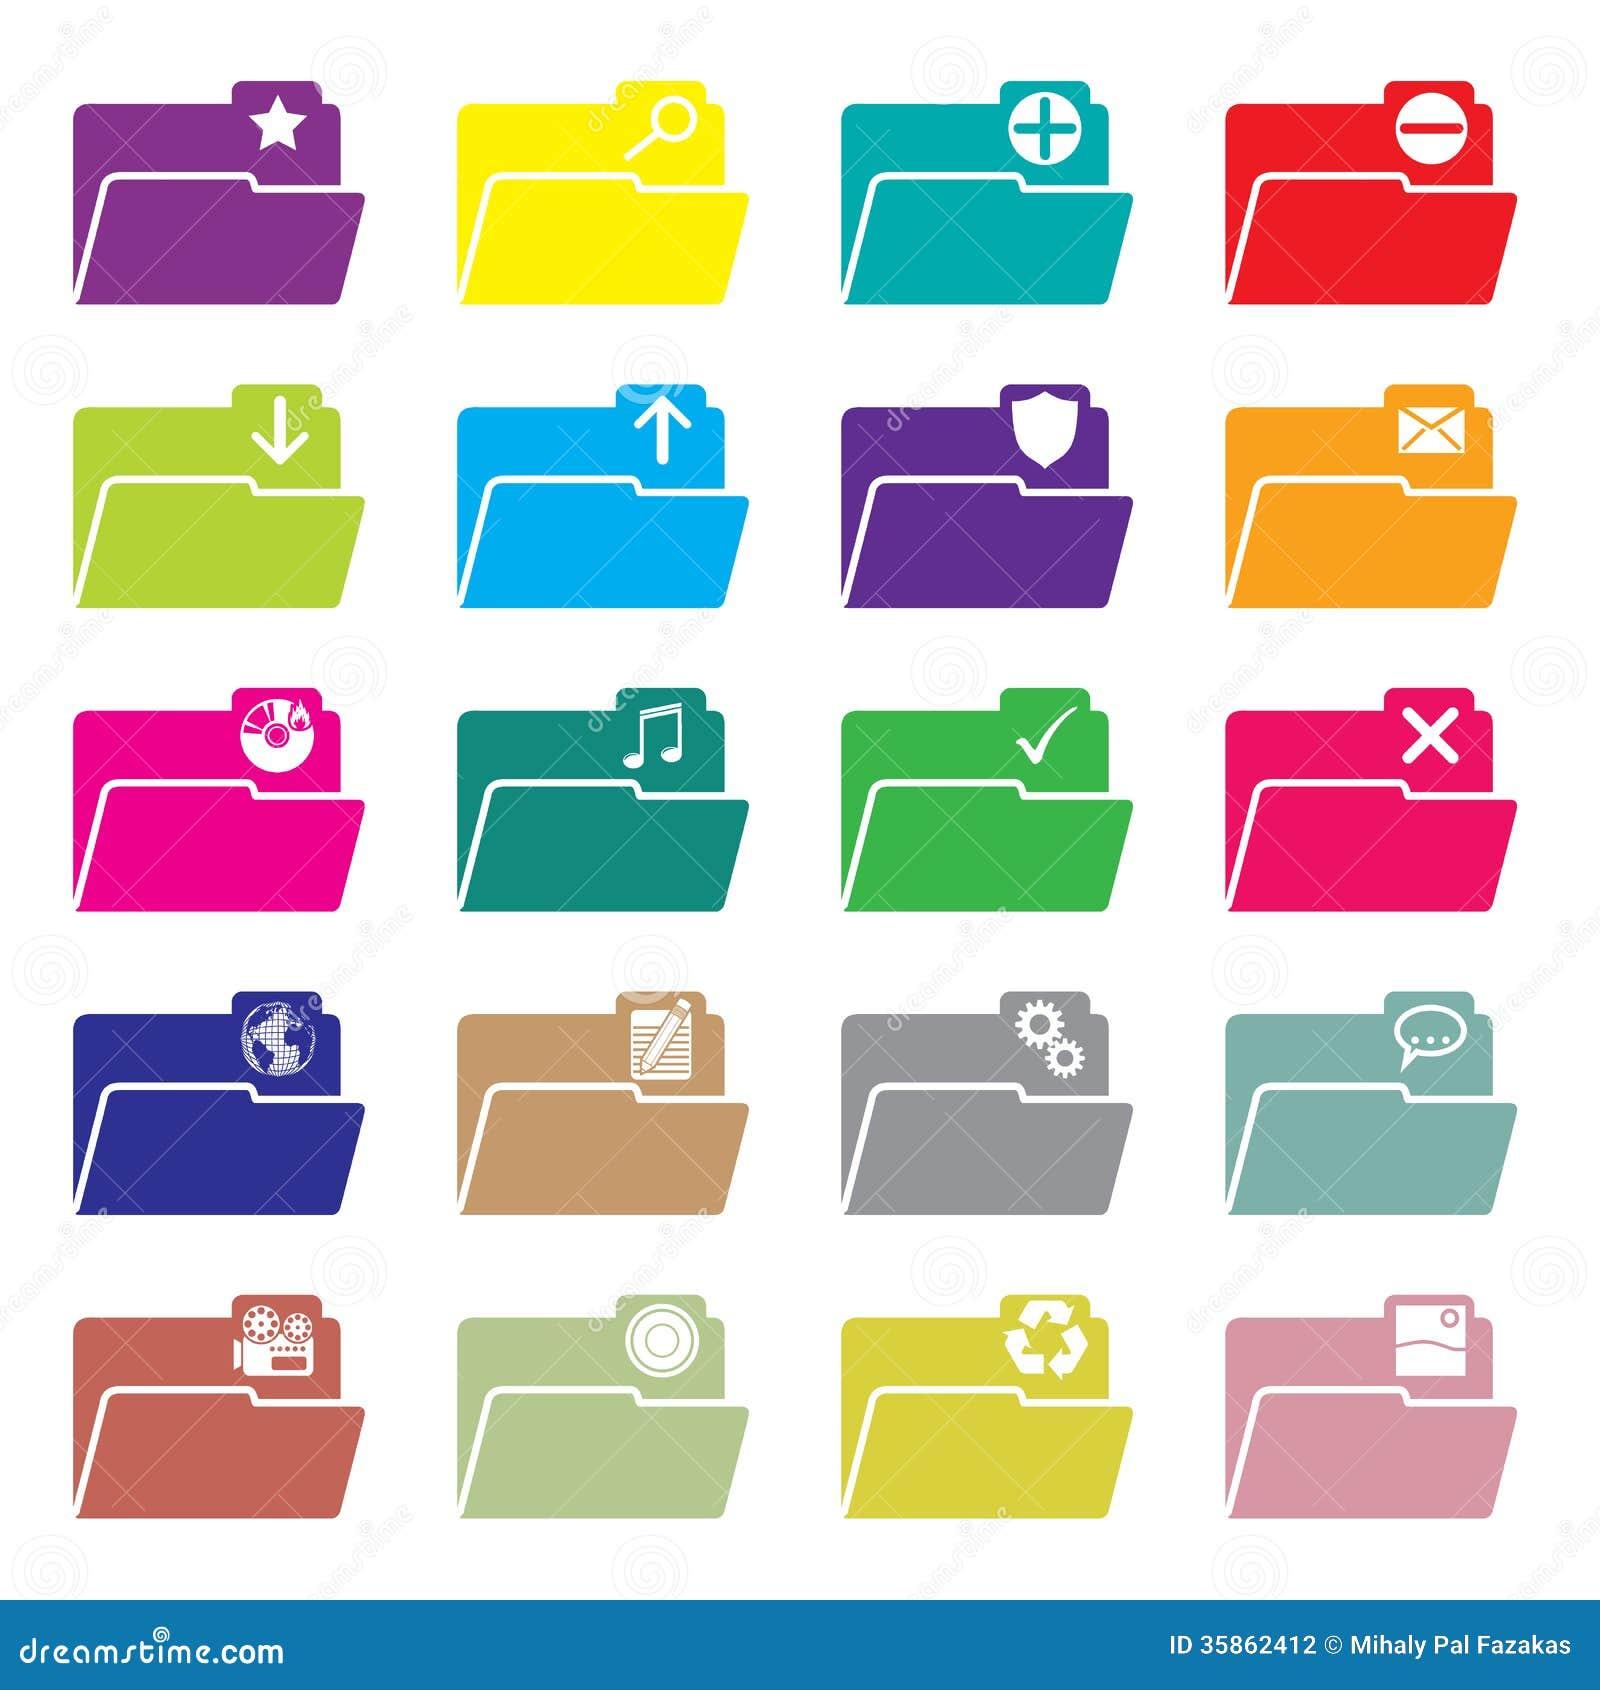 Flat folder icon set of 20 stock vector. Image of isolated ...